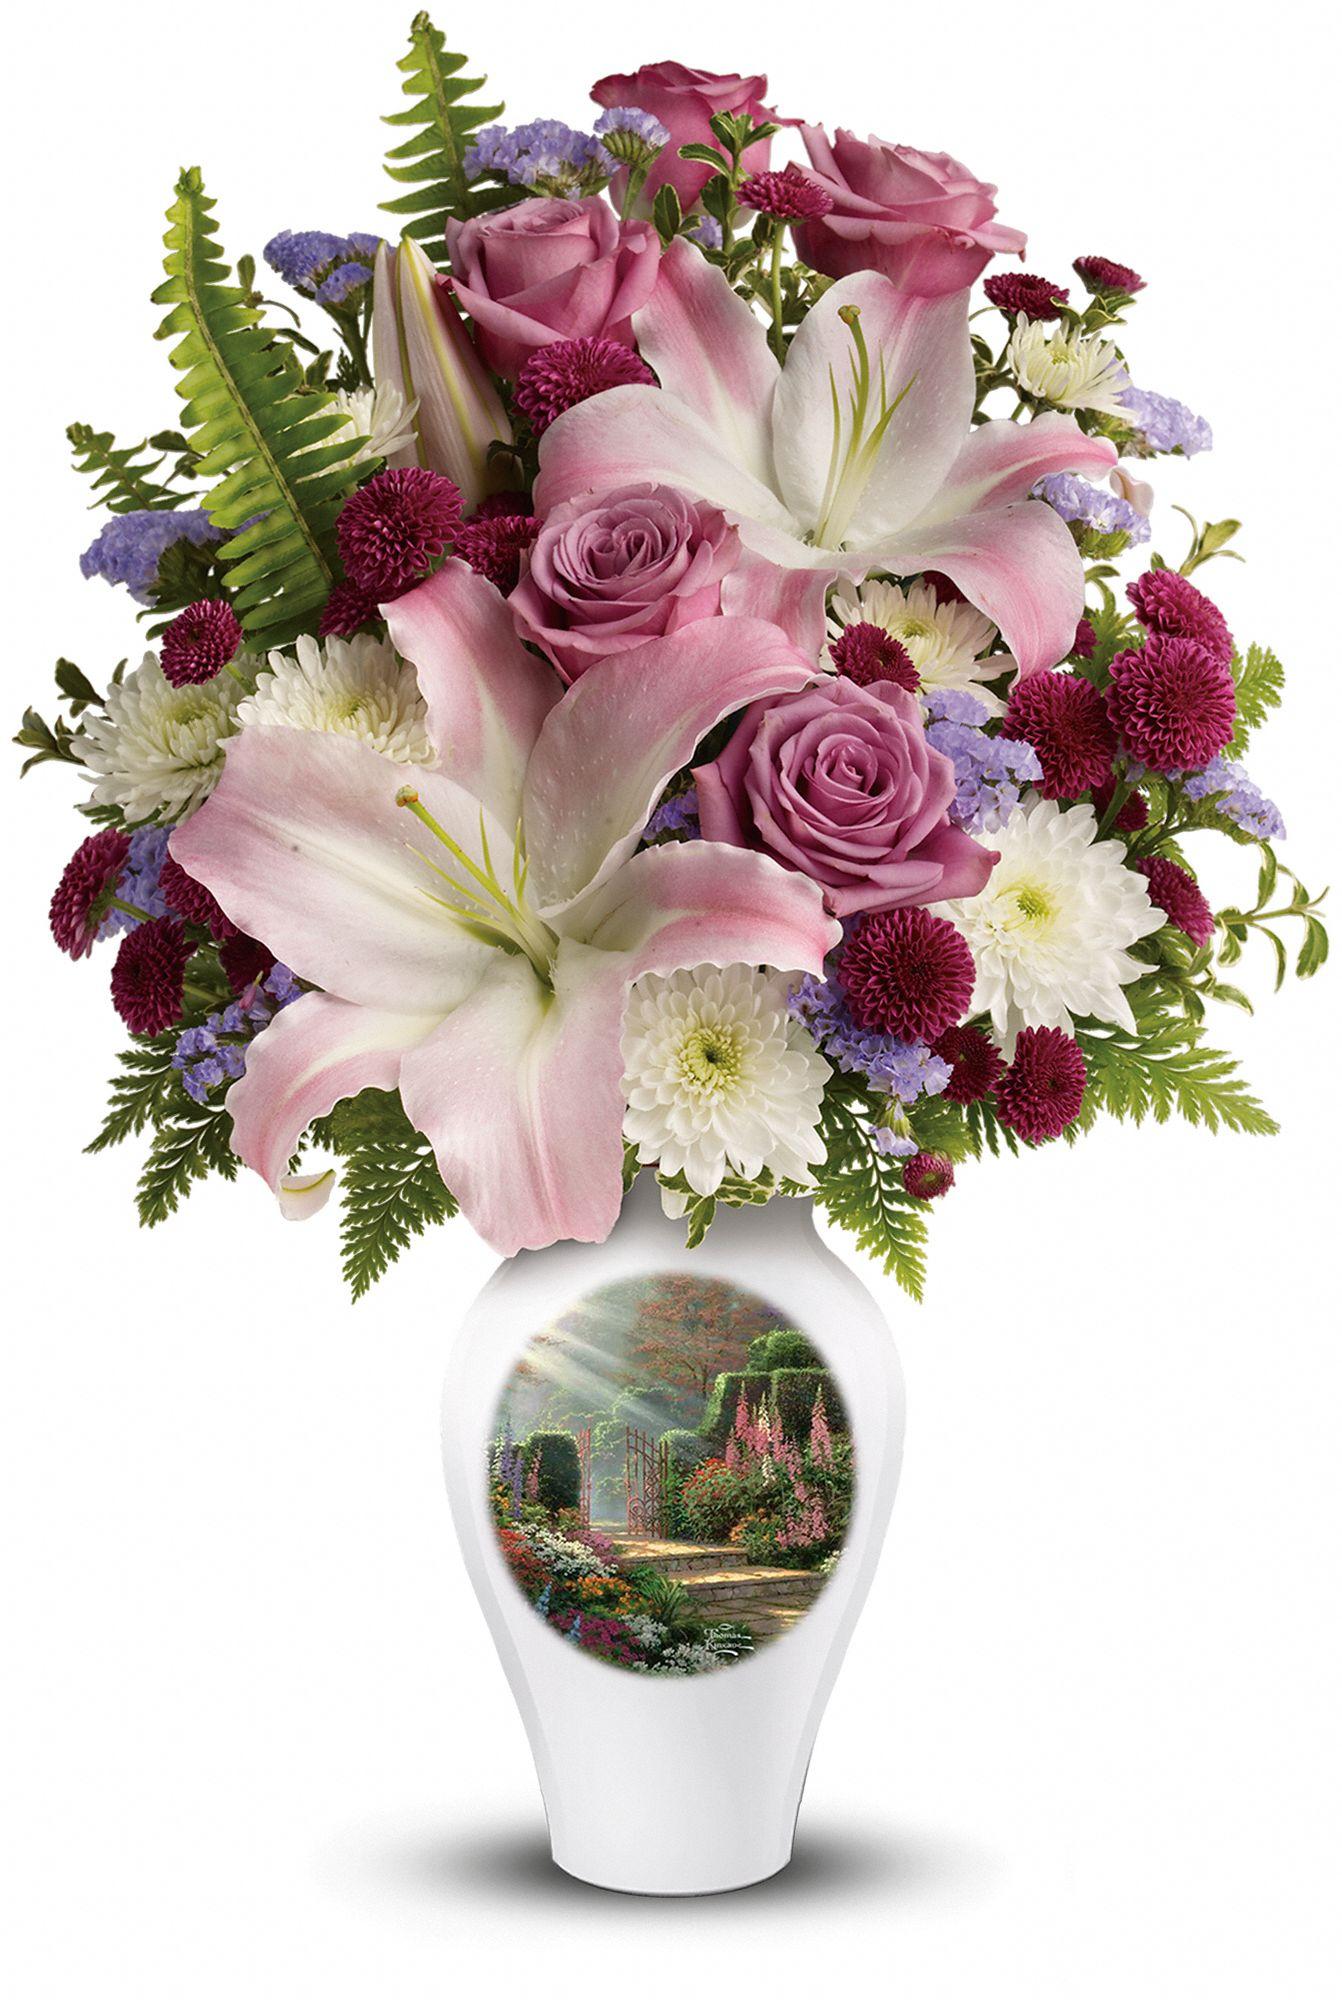 Thomas Kinkade's Moment of Grace Bouquet